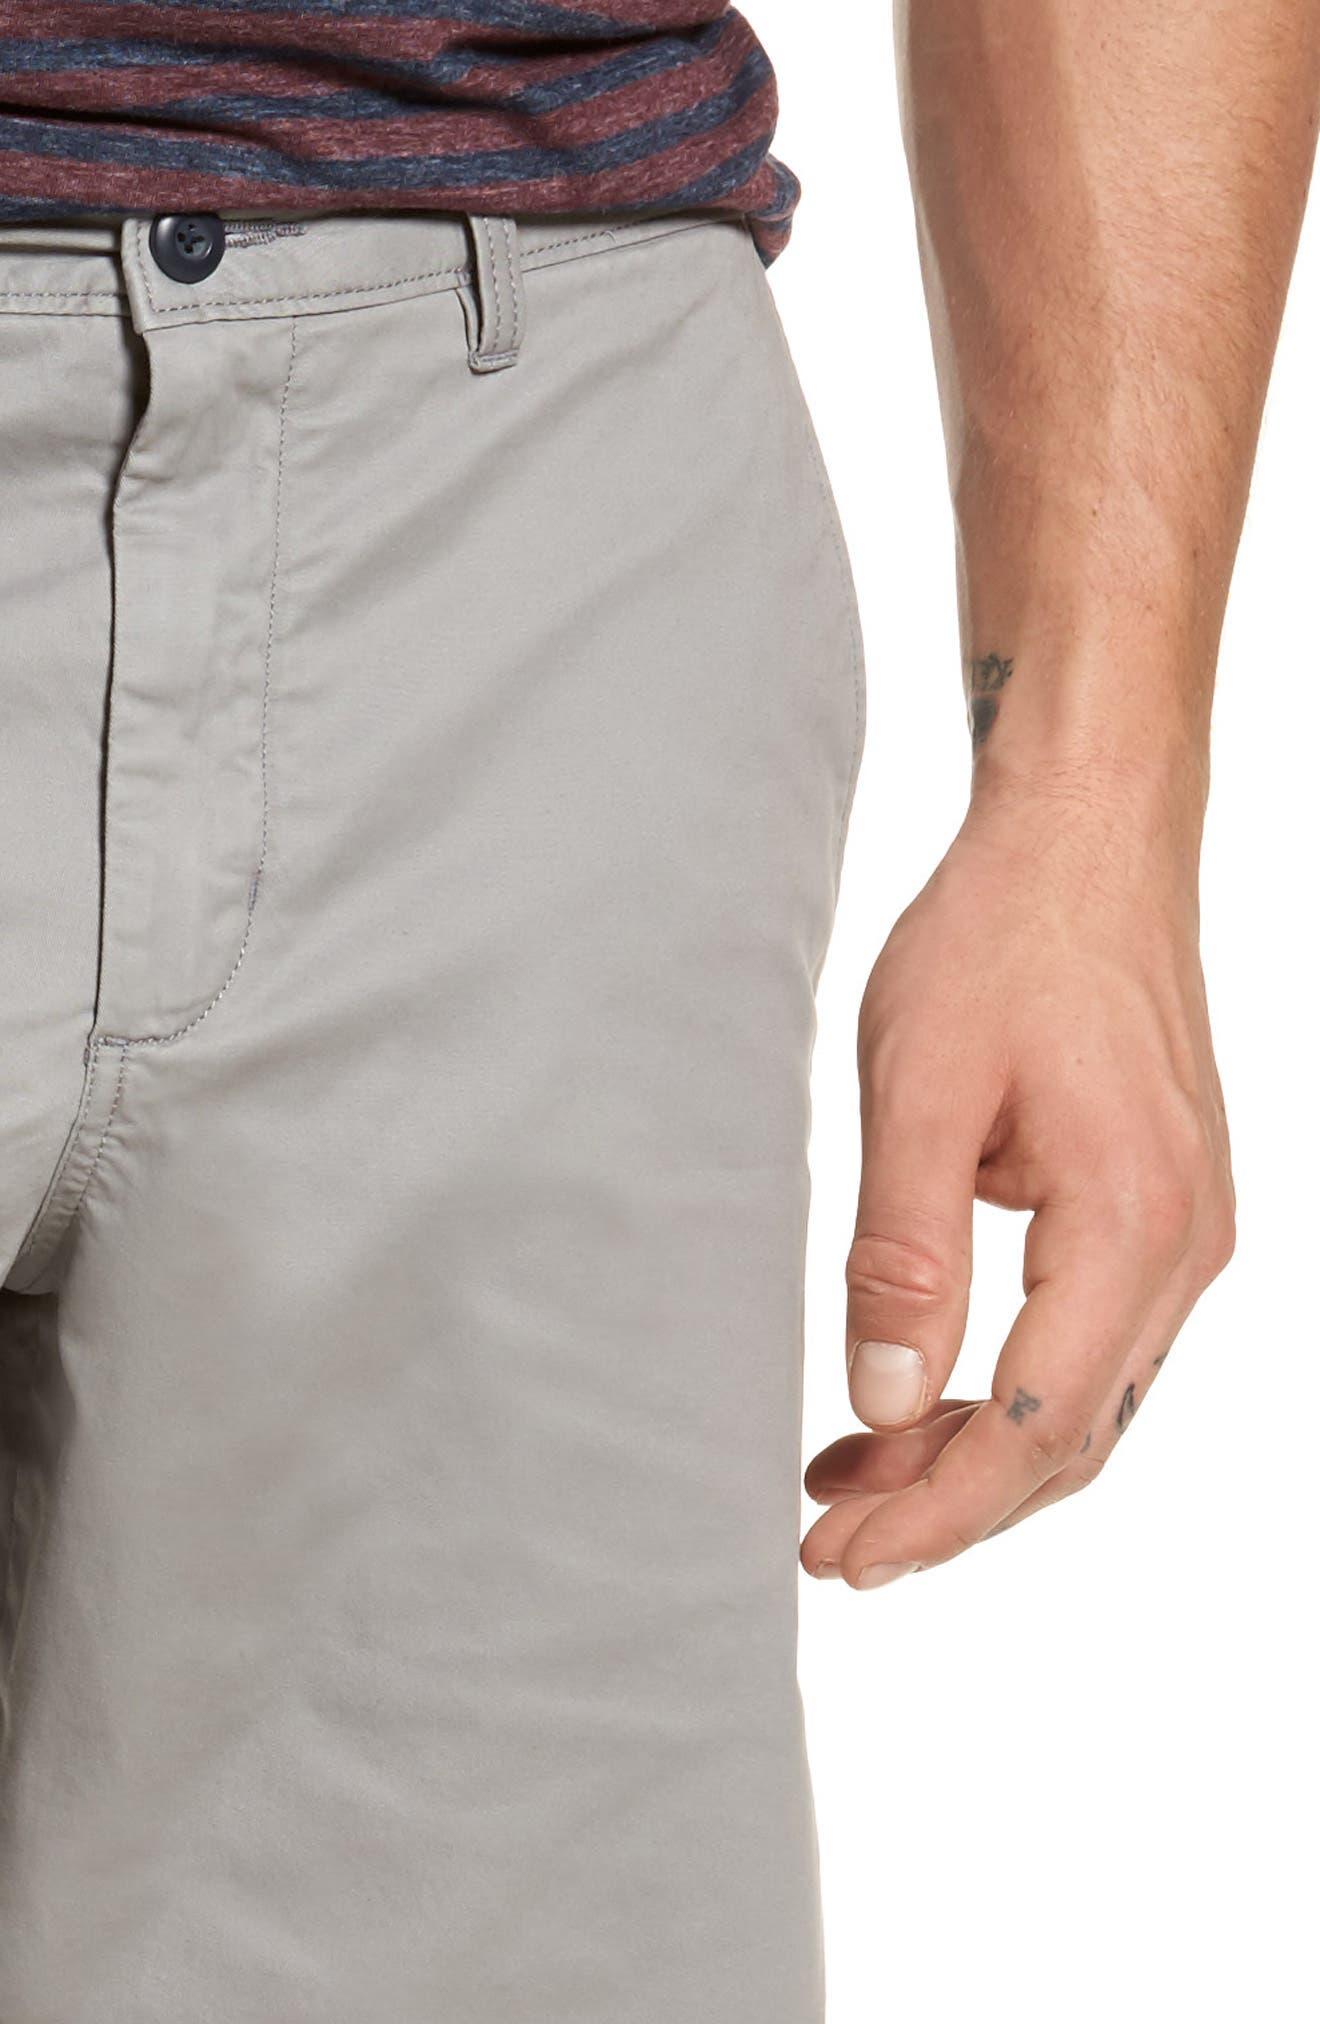 Ballard Slim Fit Stretch Chino 11-Inch Shorts,                             Alternate thumbnail 52, color,